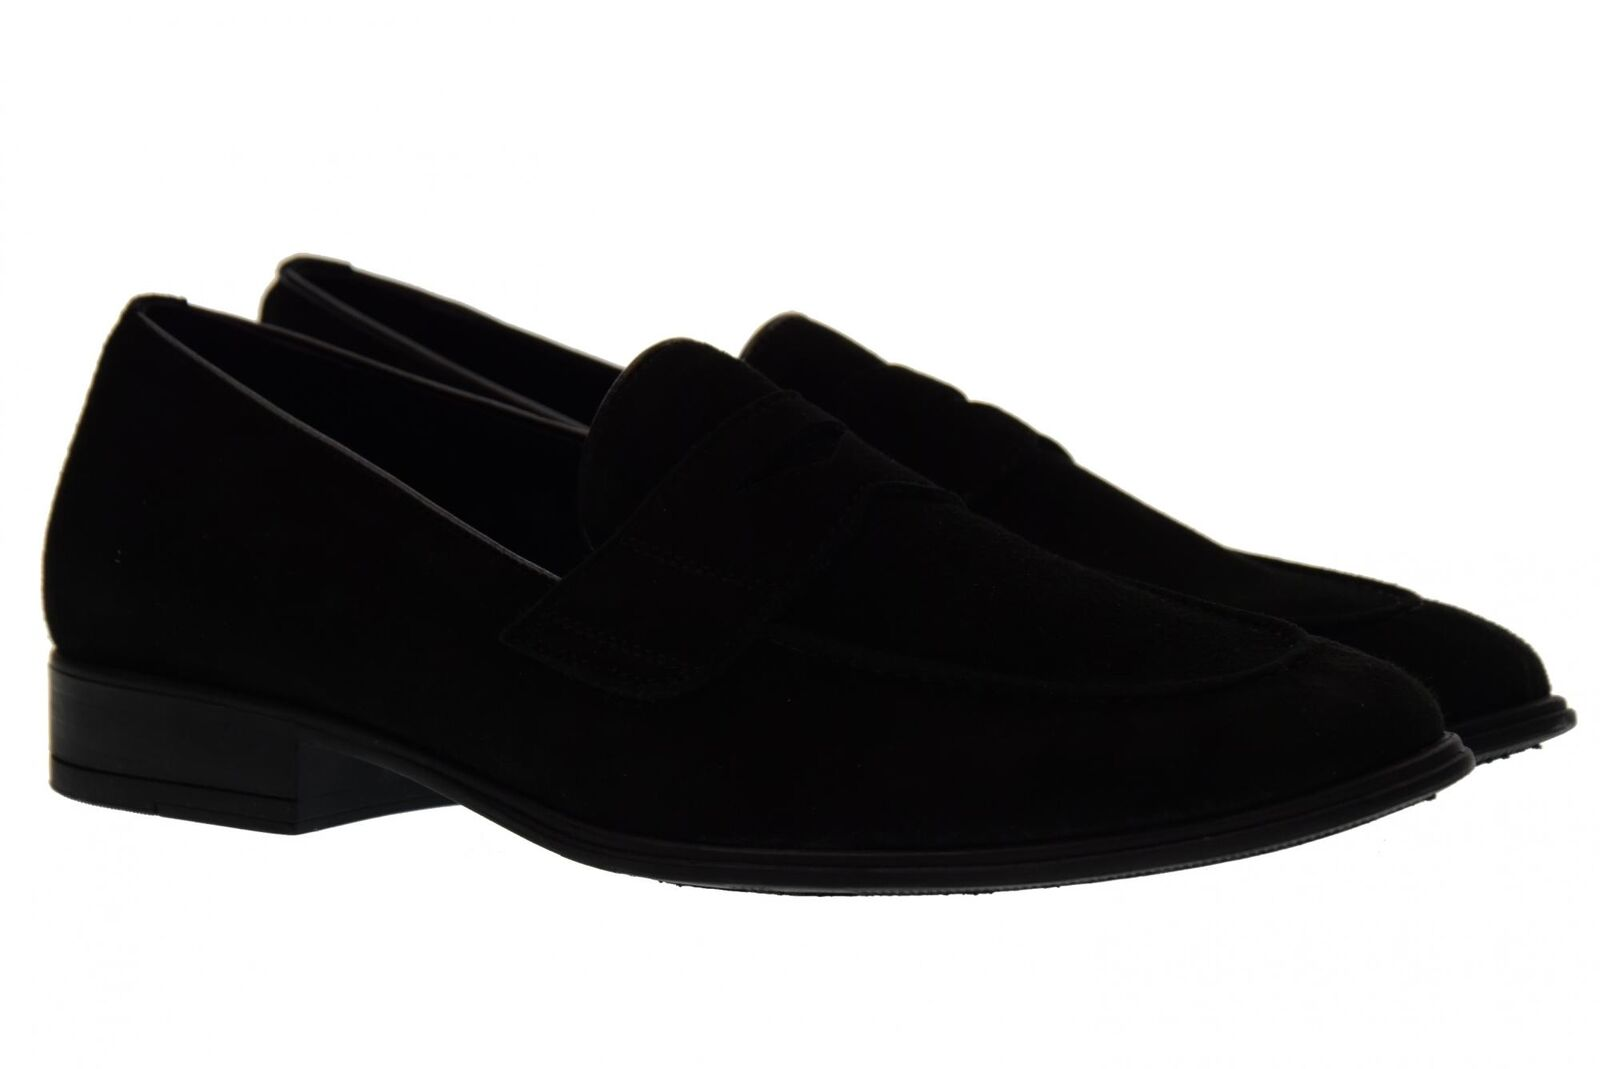 Antica Cuoieria Mannmüßiggänger Schuhe 19763-A-S67 AMALFI BLACK P18g